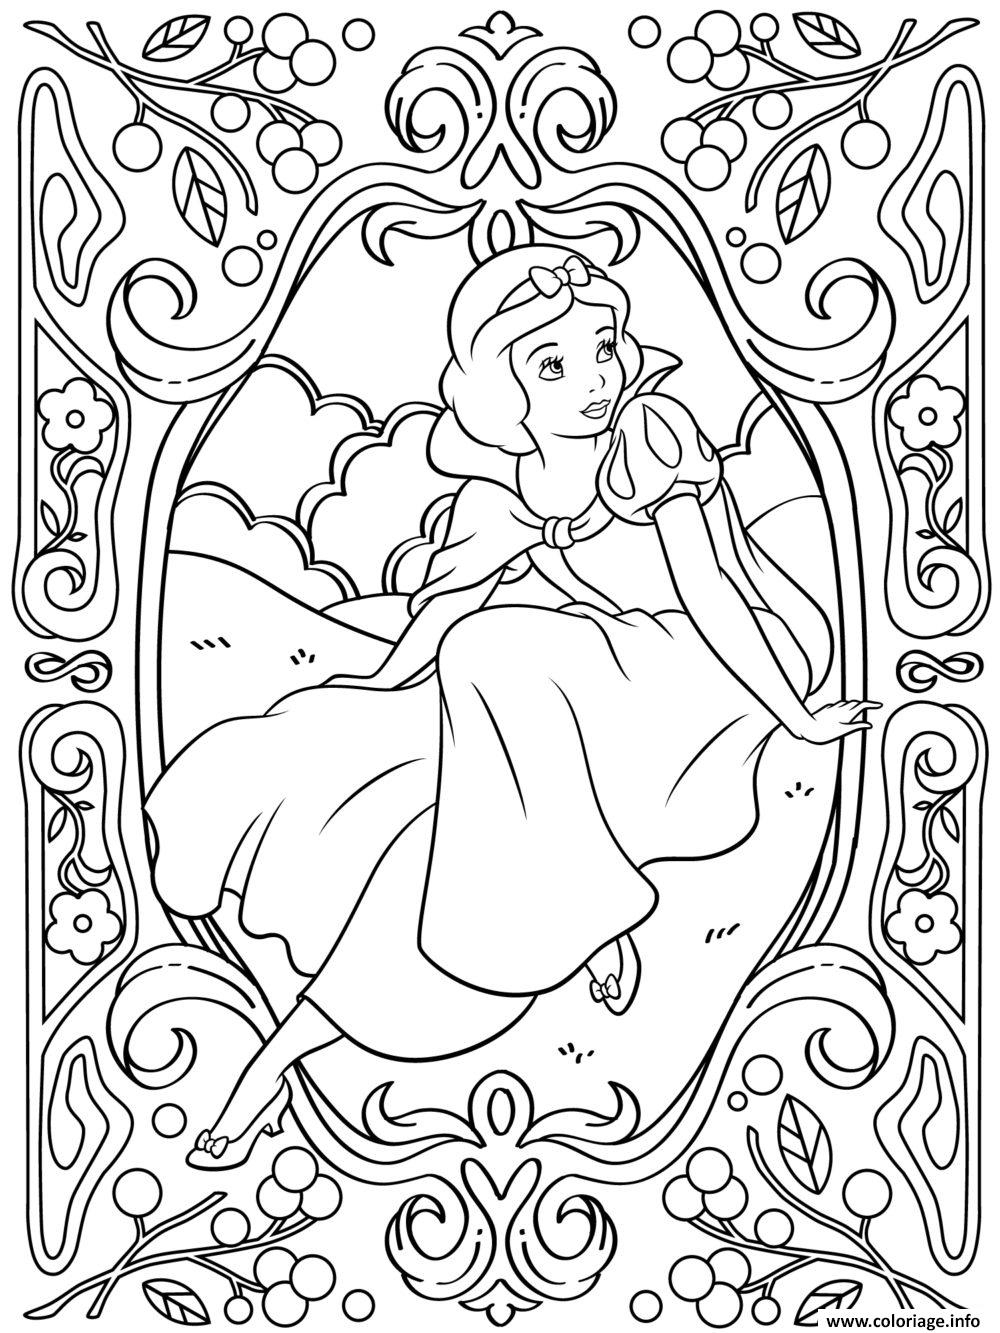 Coloriage Mandala Disney Princesse Blanche Neige Dessin dedans Coloriage De Blanche Neige À Imprimer